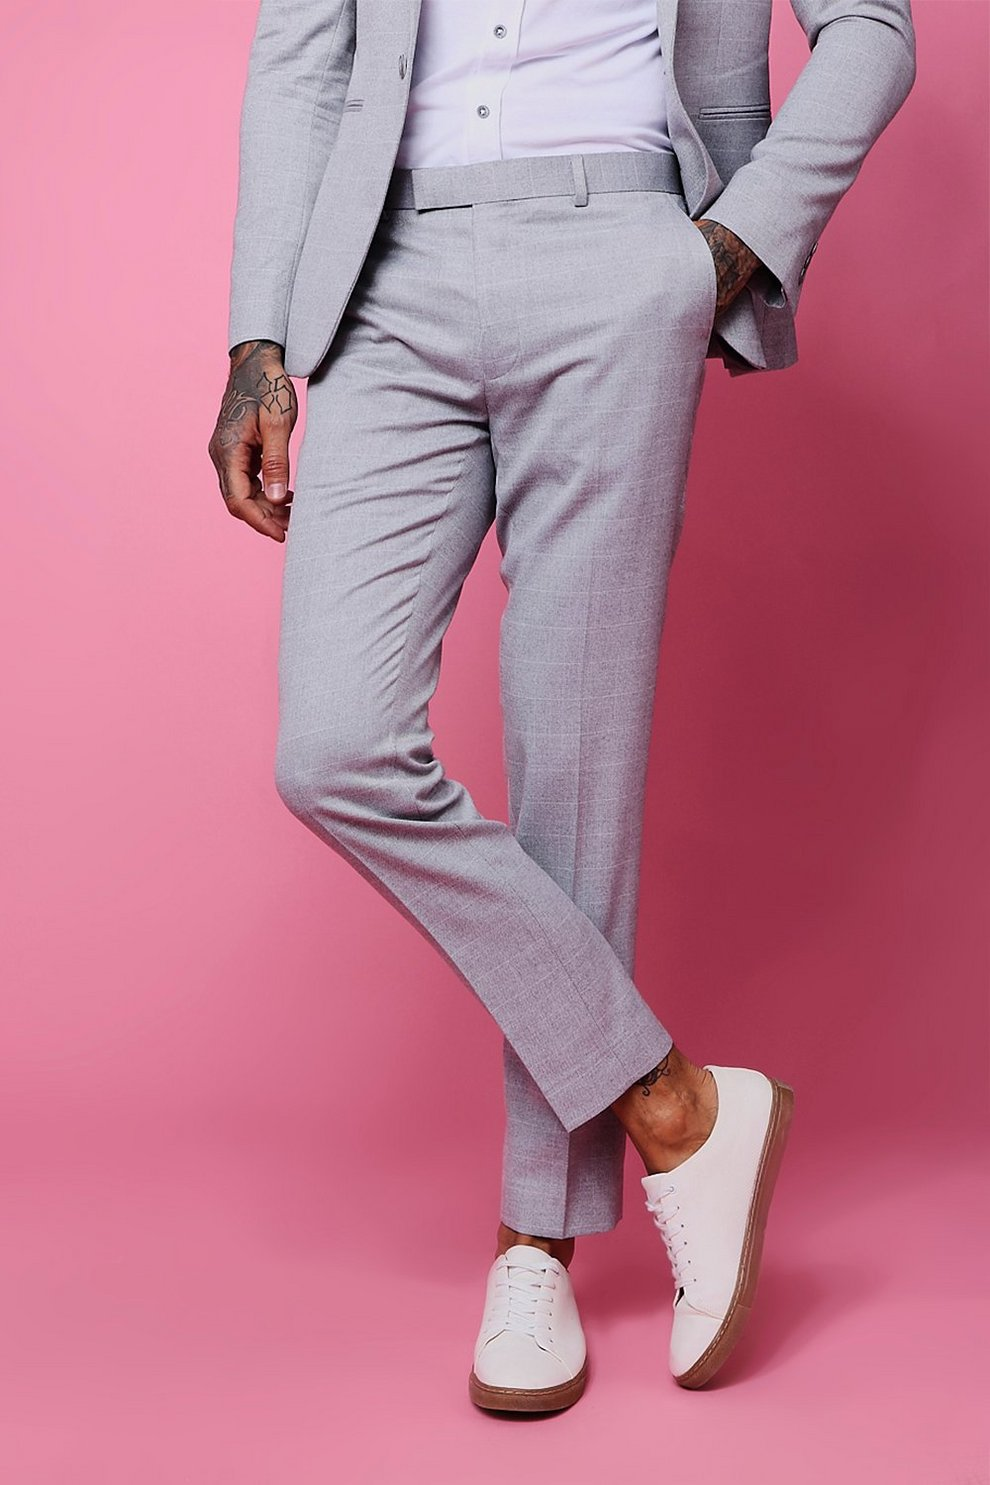 eb08b01d63da Window Pane Check Skinny Fit Trouser | Boohoo